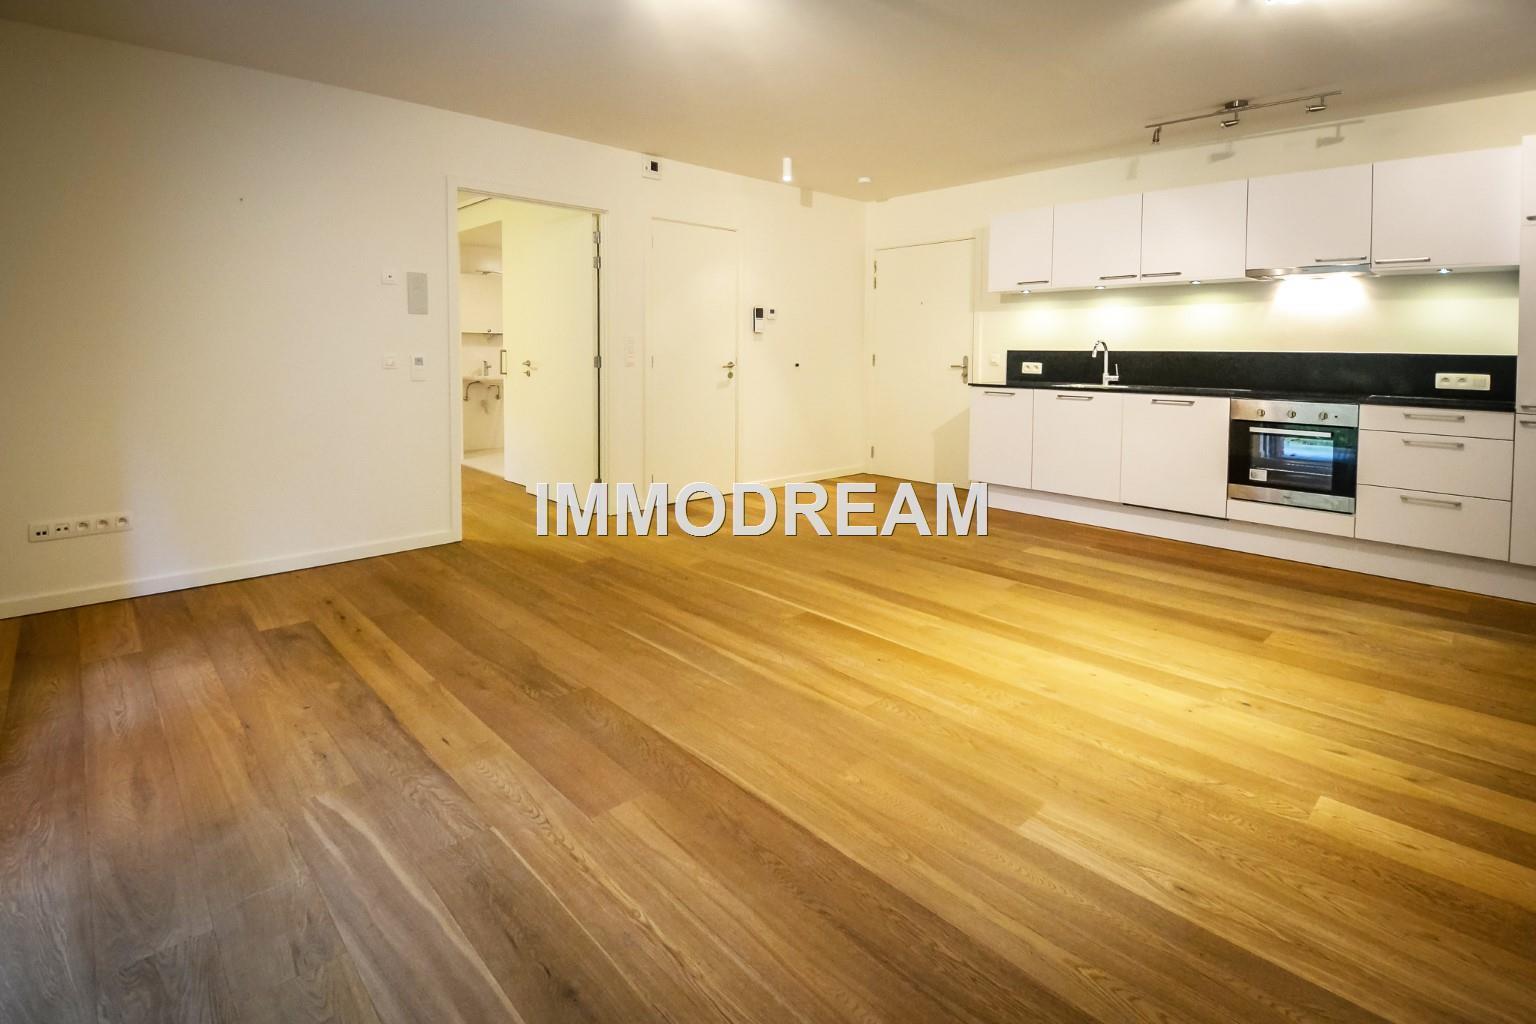 Residences-services - Wezembeek-Oppem - #3909185-3